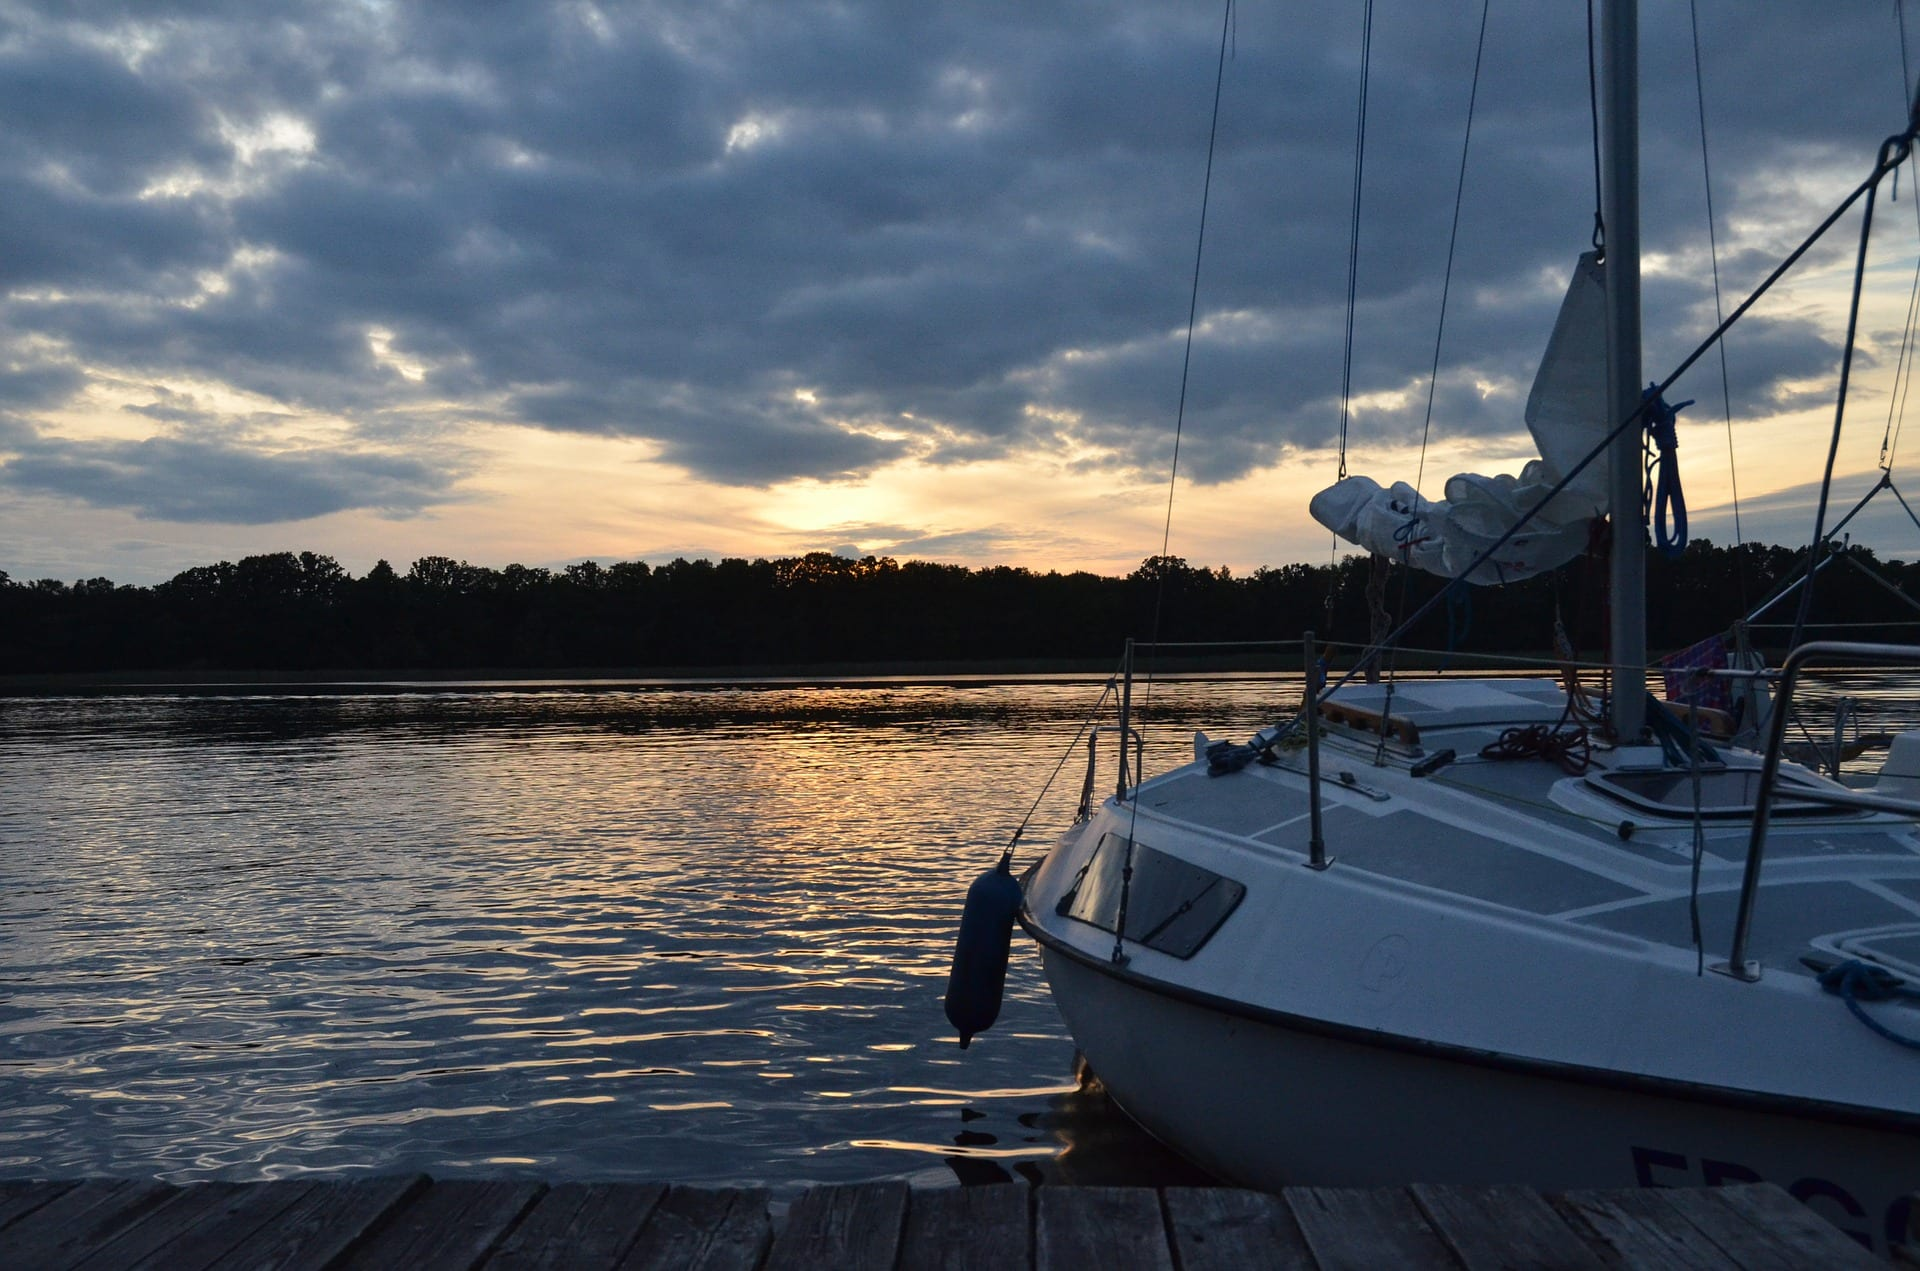 Sailing in Poland